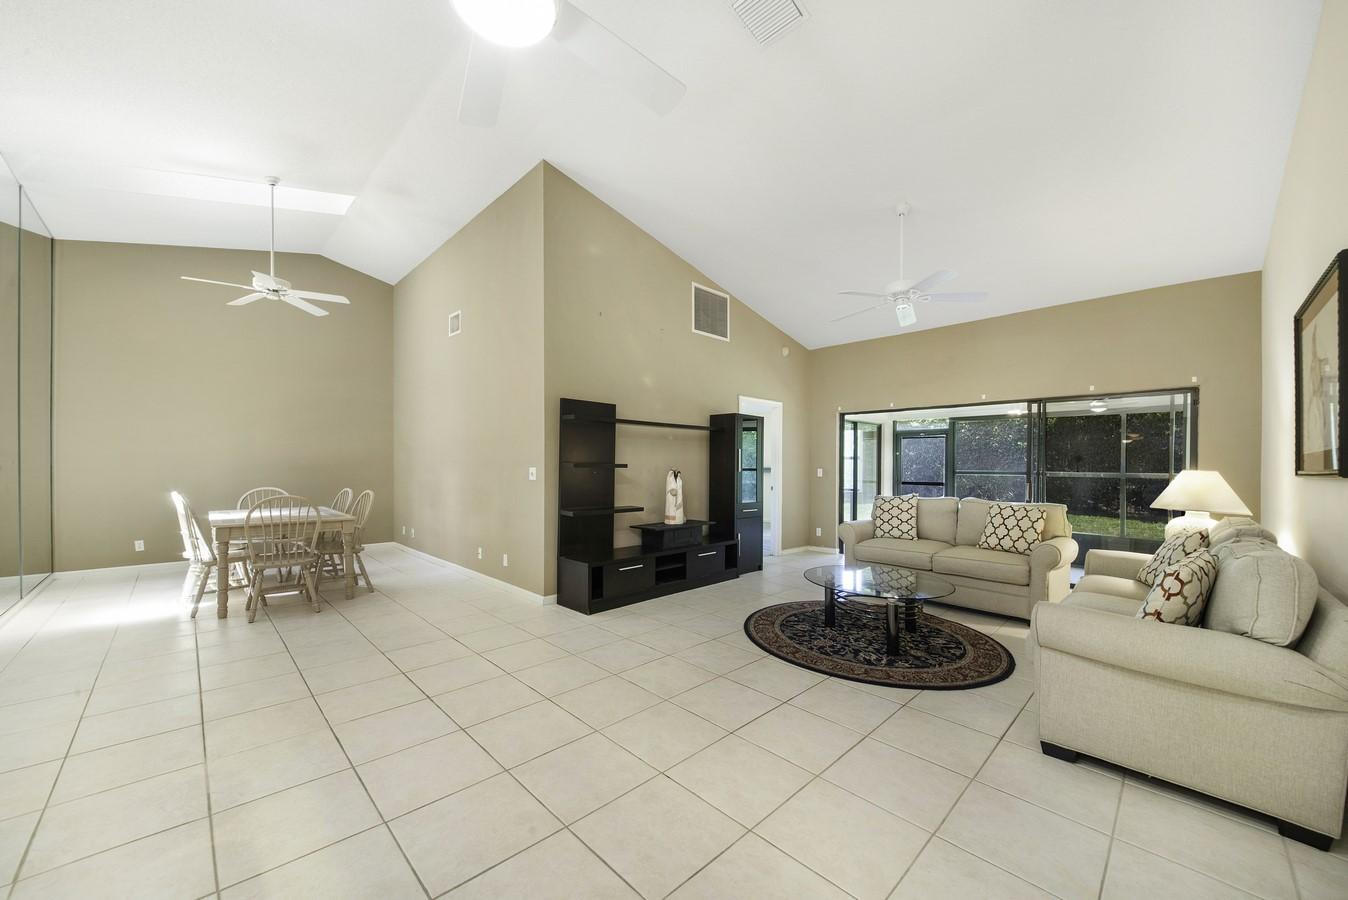 9747 Pavarotti Terrace 103 Boynton Beach, FL 33437 photo 4